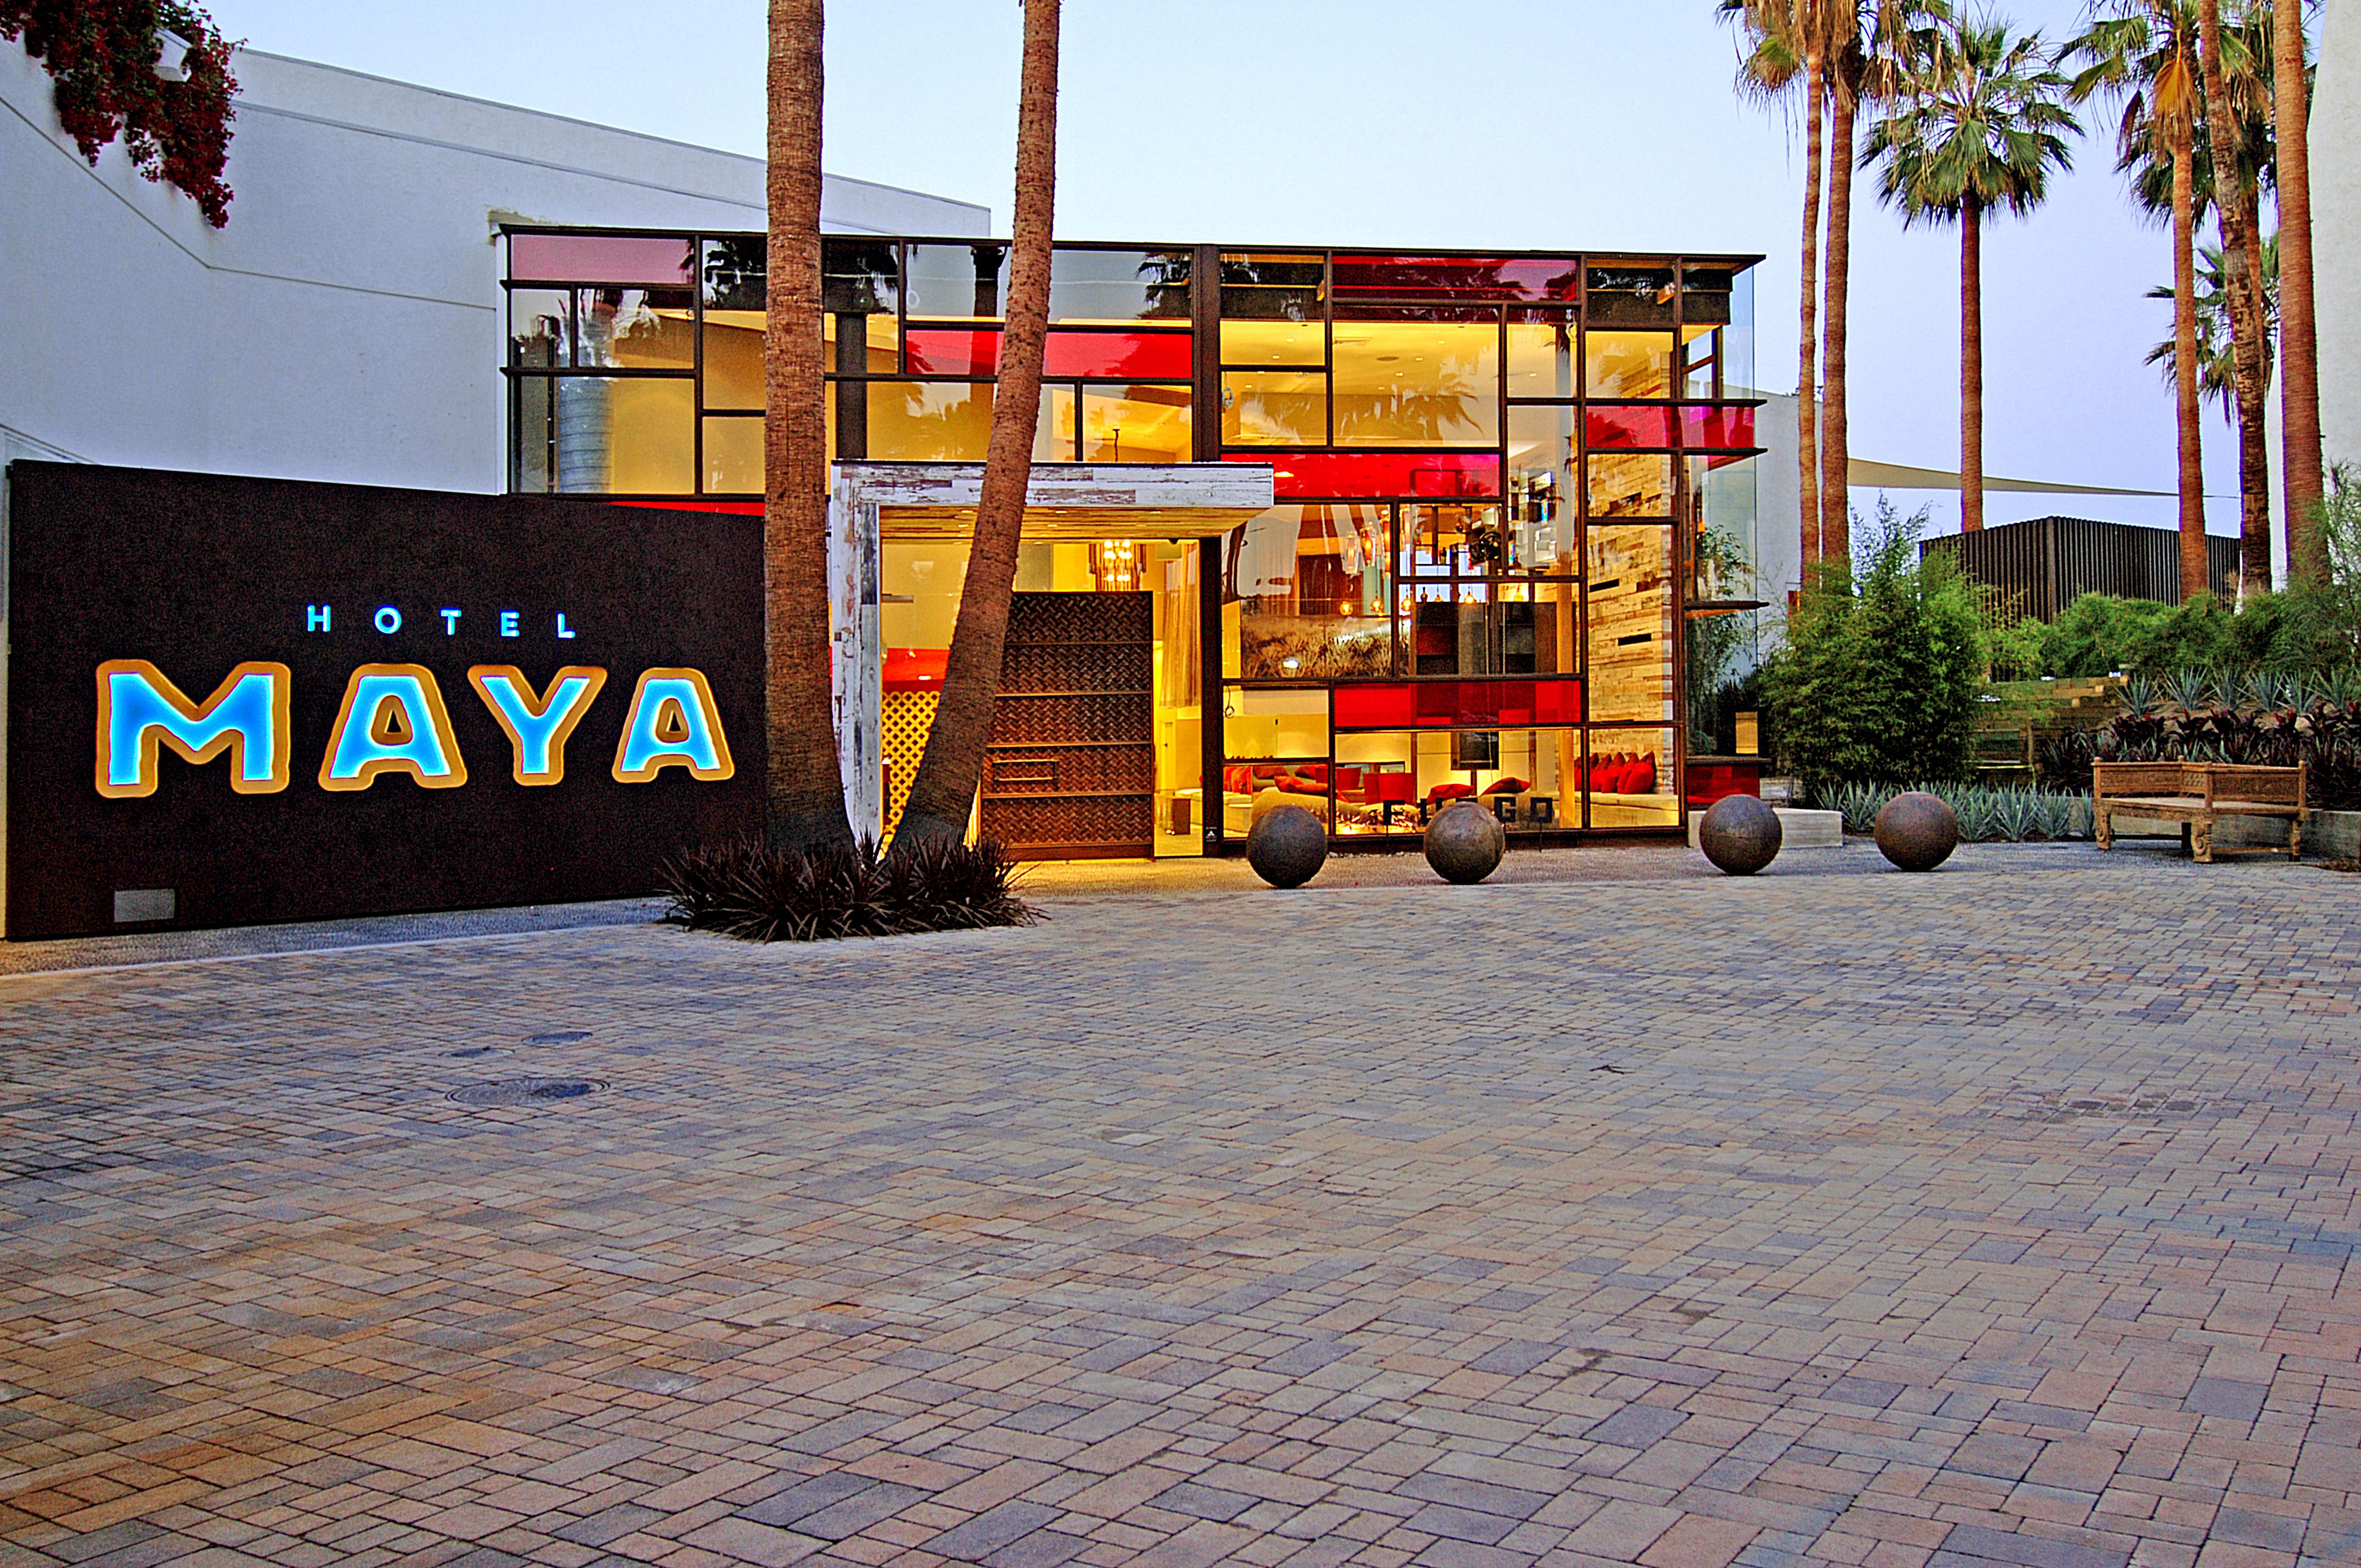 Hotel Maya Exterior